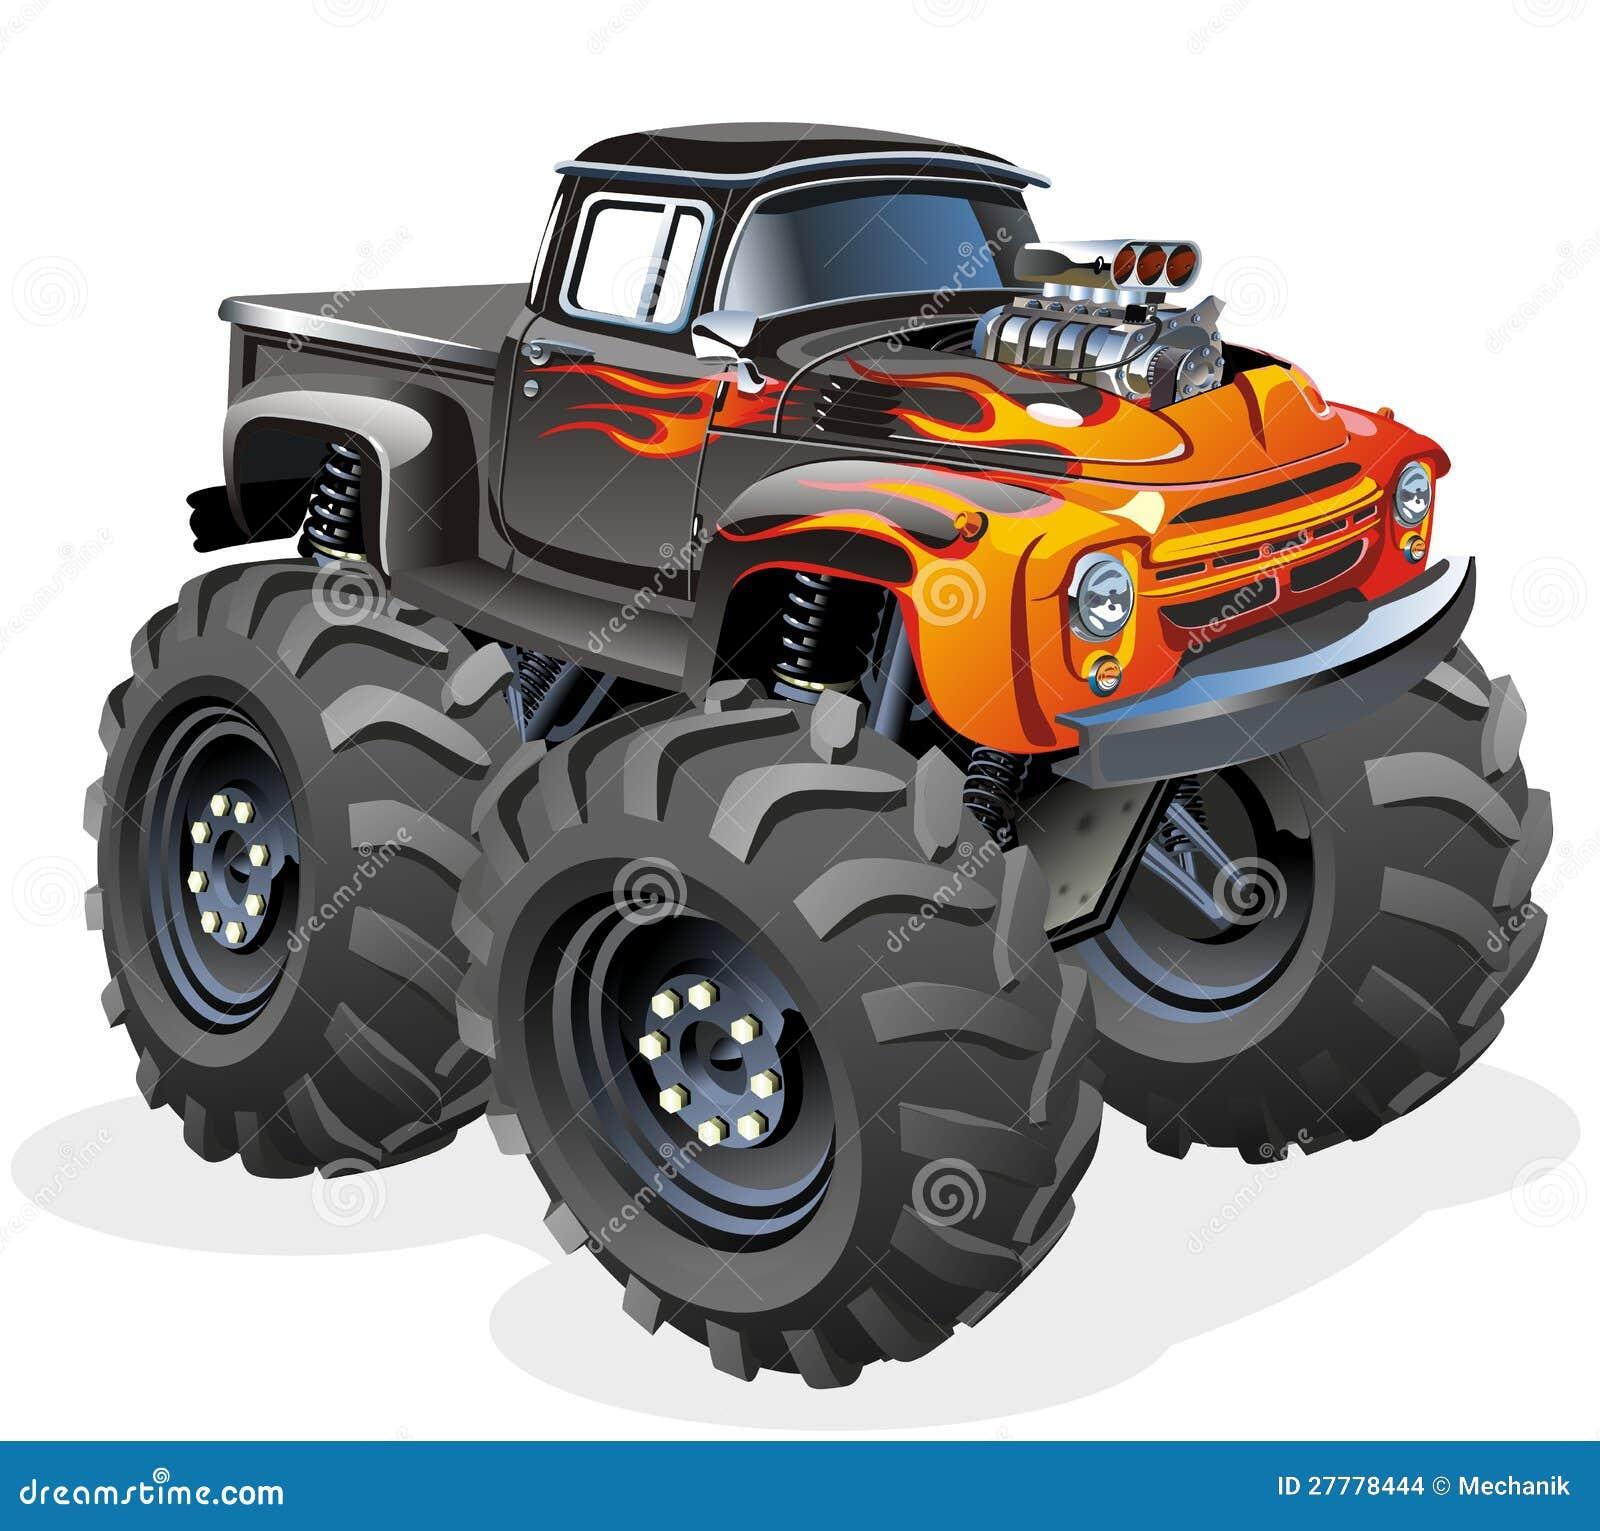 cartoon mixer monster truck stock vector illustration of extreme